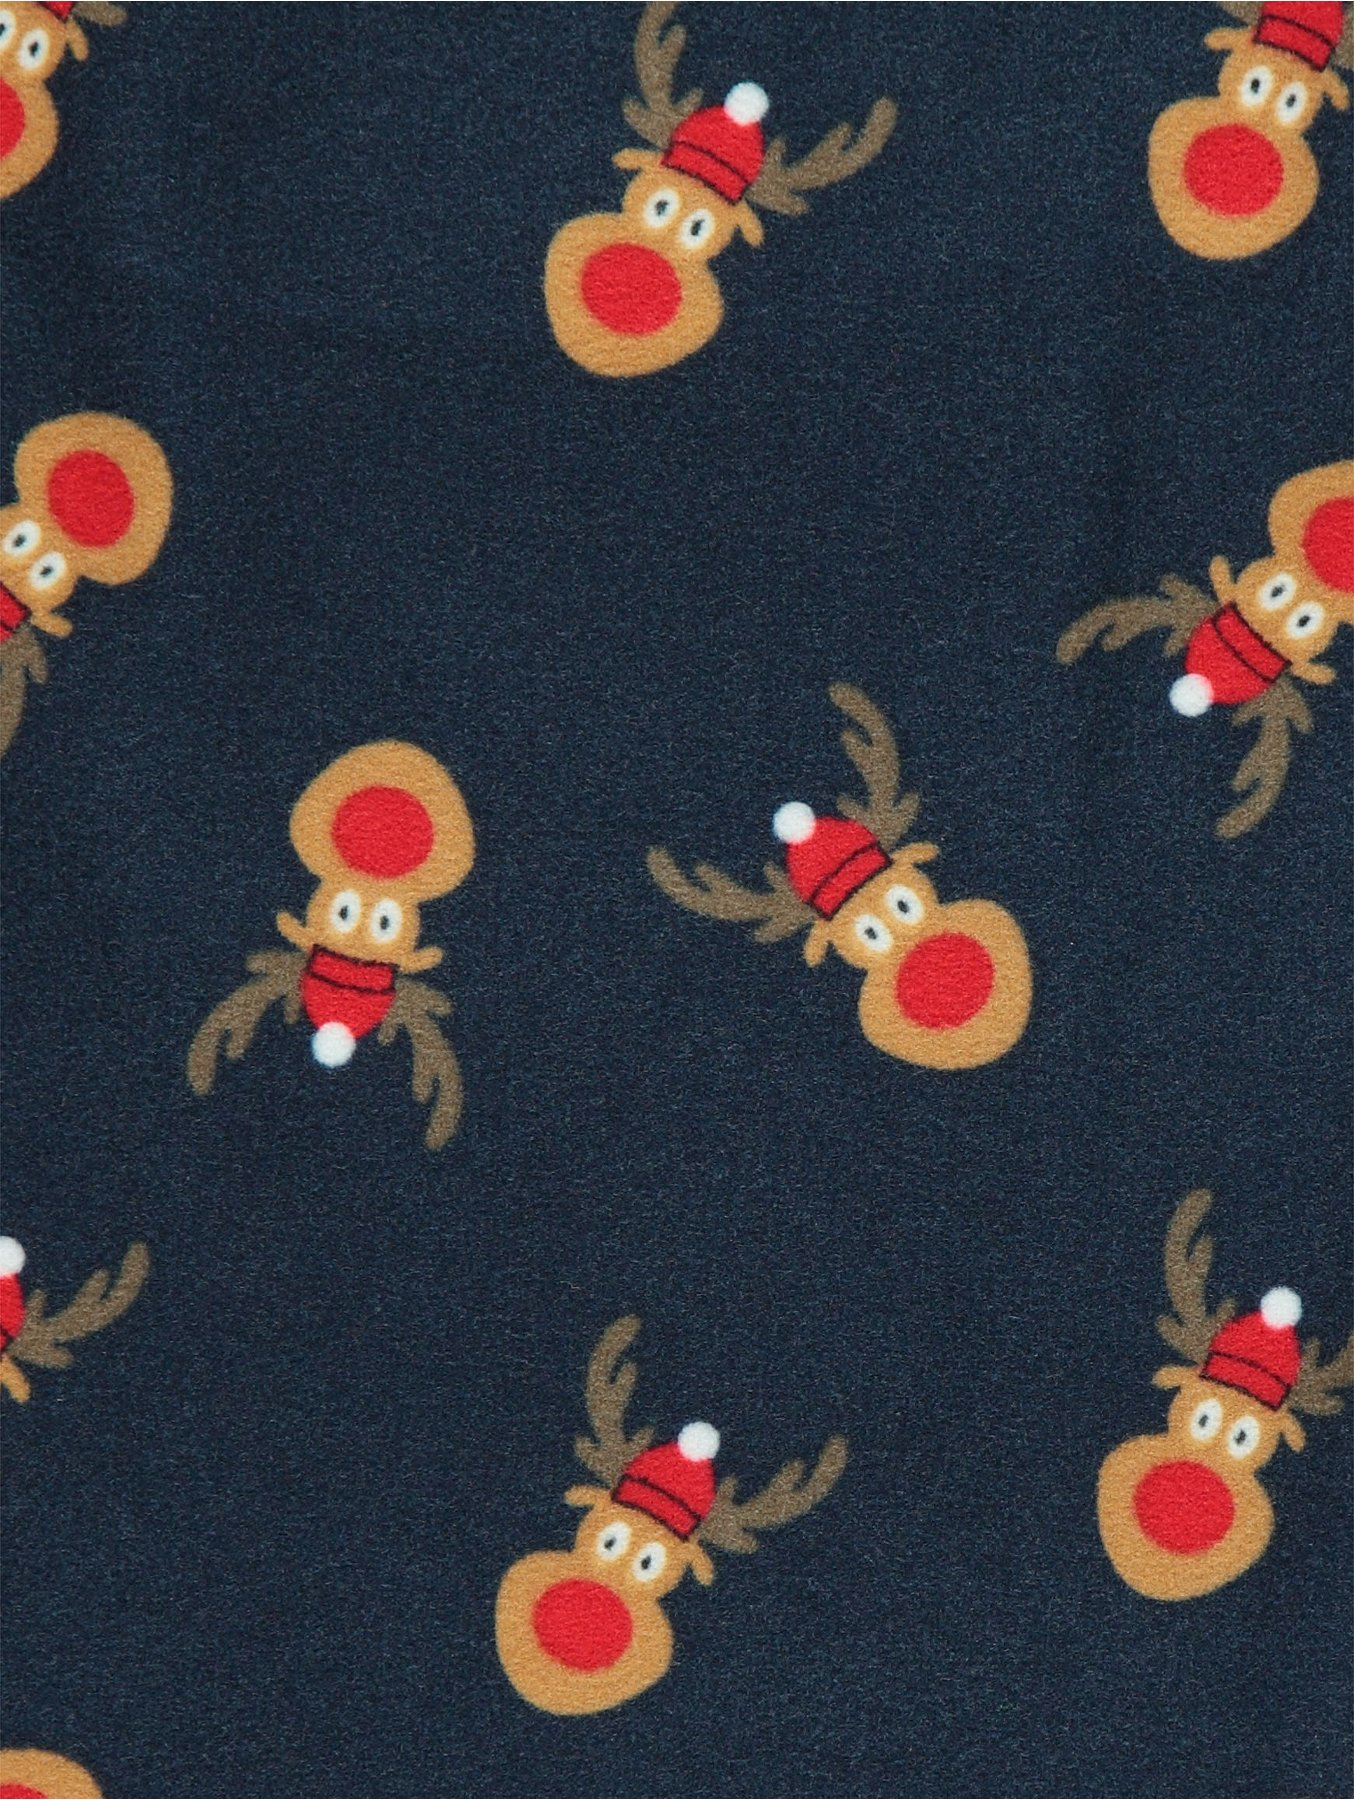 01a600fc23 Reindeer Print Christmas Lounge Pants. Reset